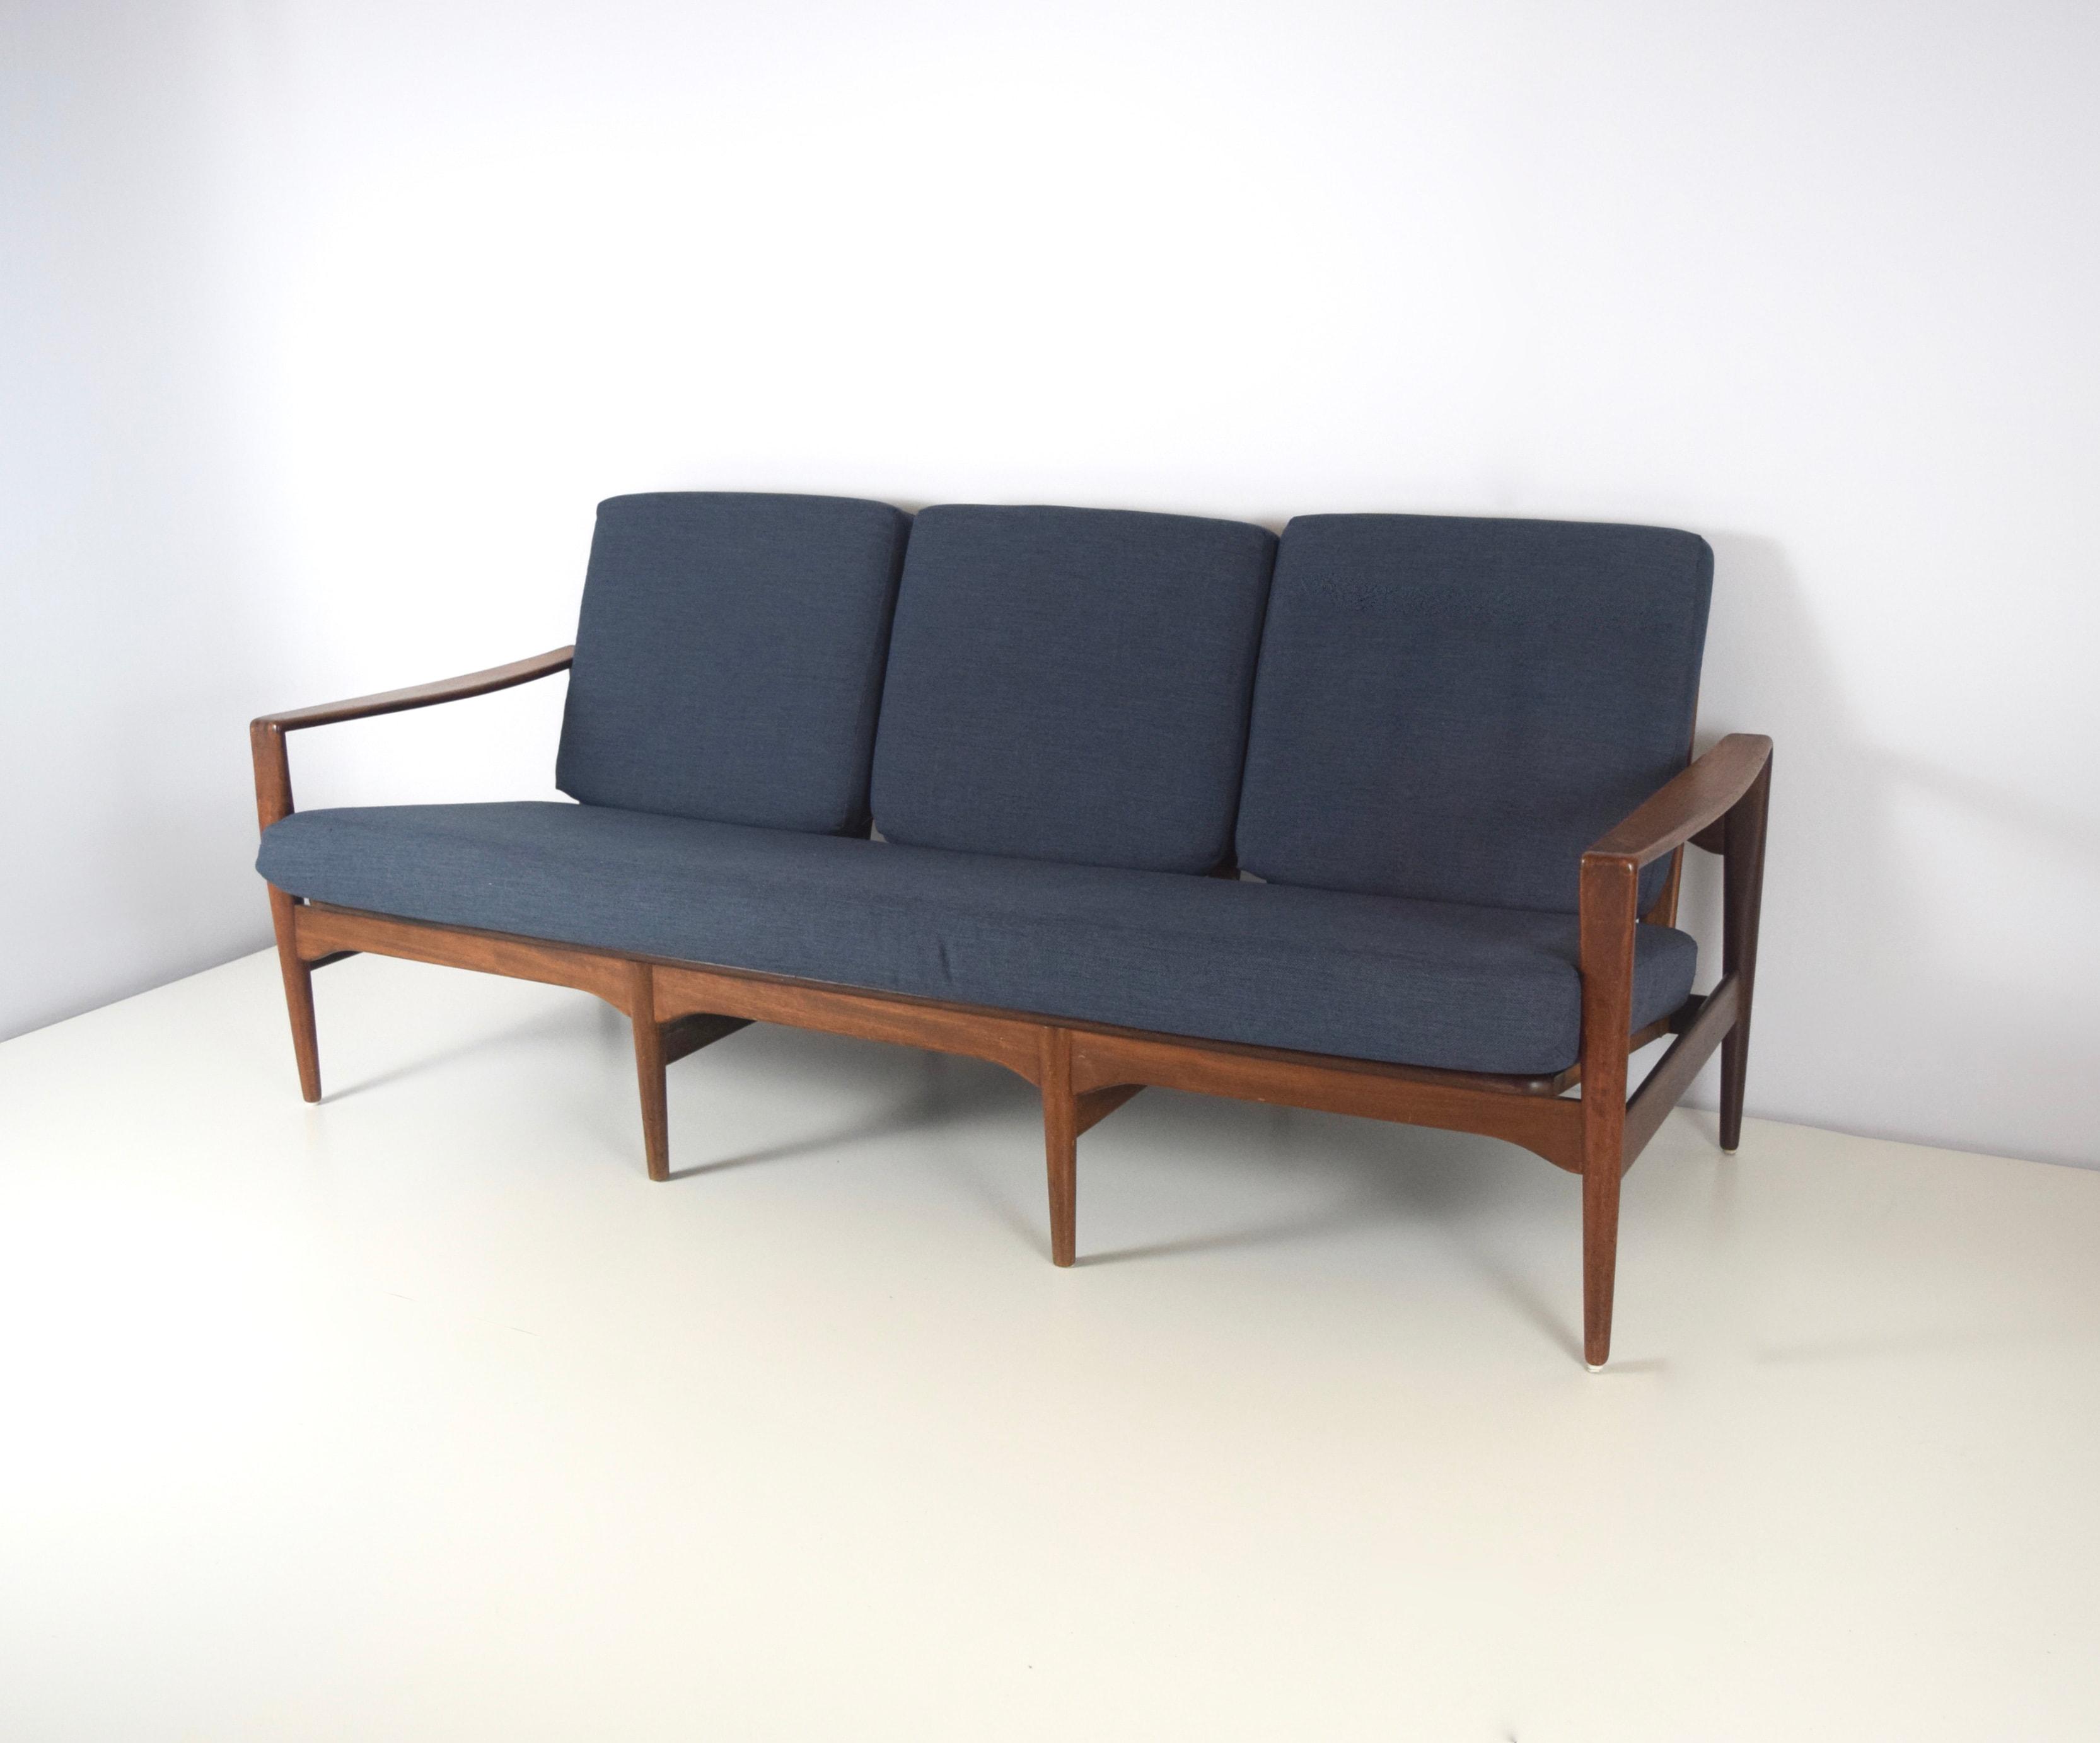 Arne Wahl Iversen Sofa for KOMFORT in Rosewood, Denmark 1950's